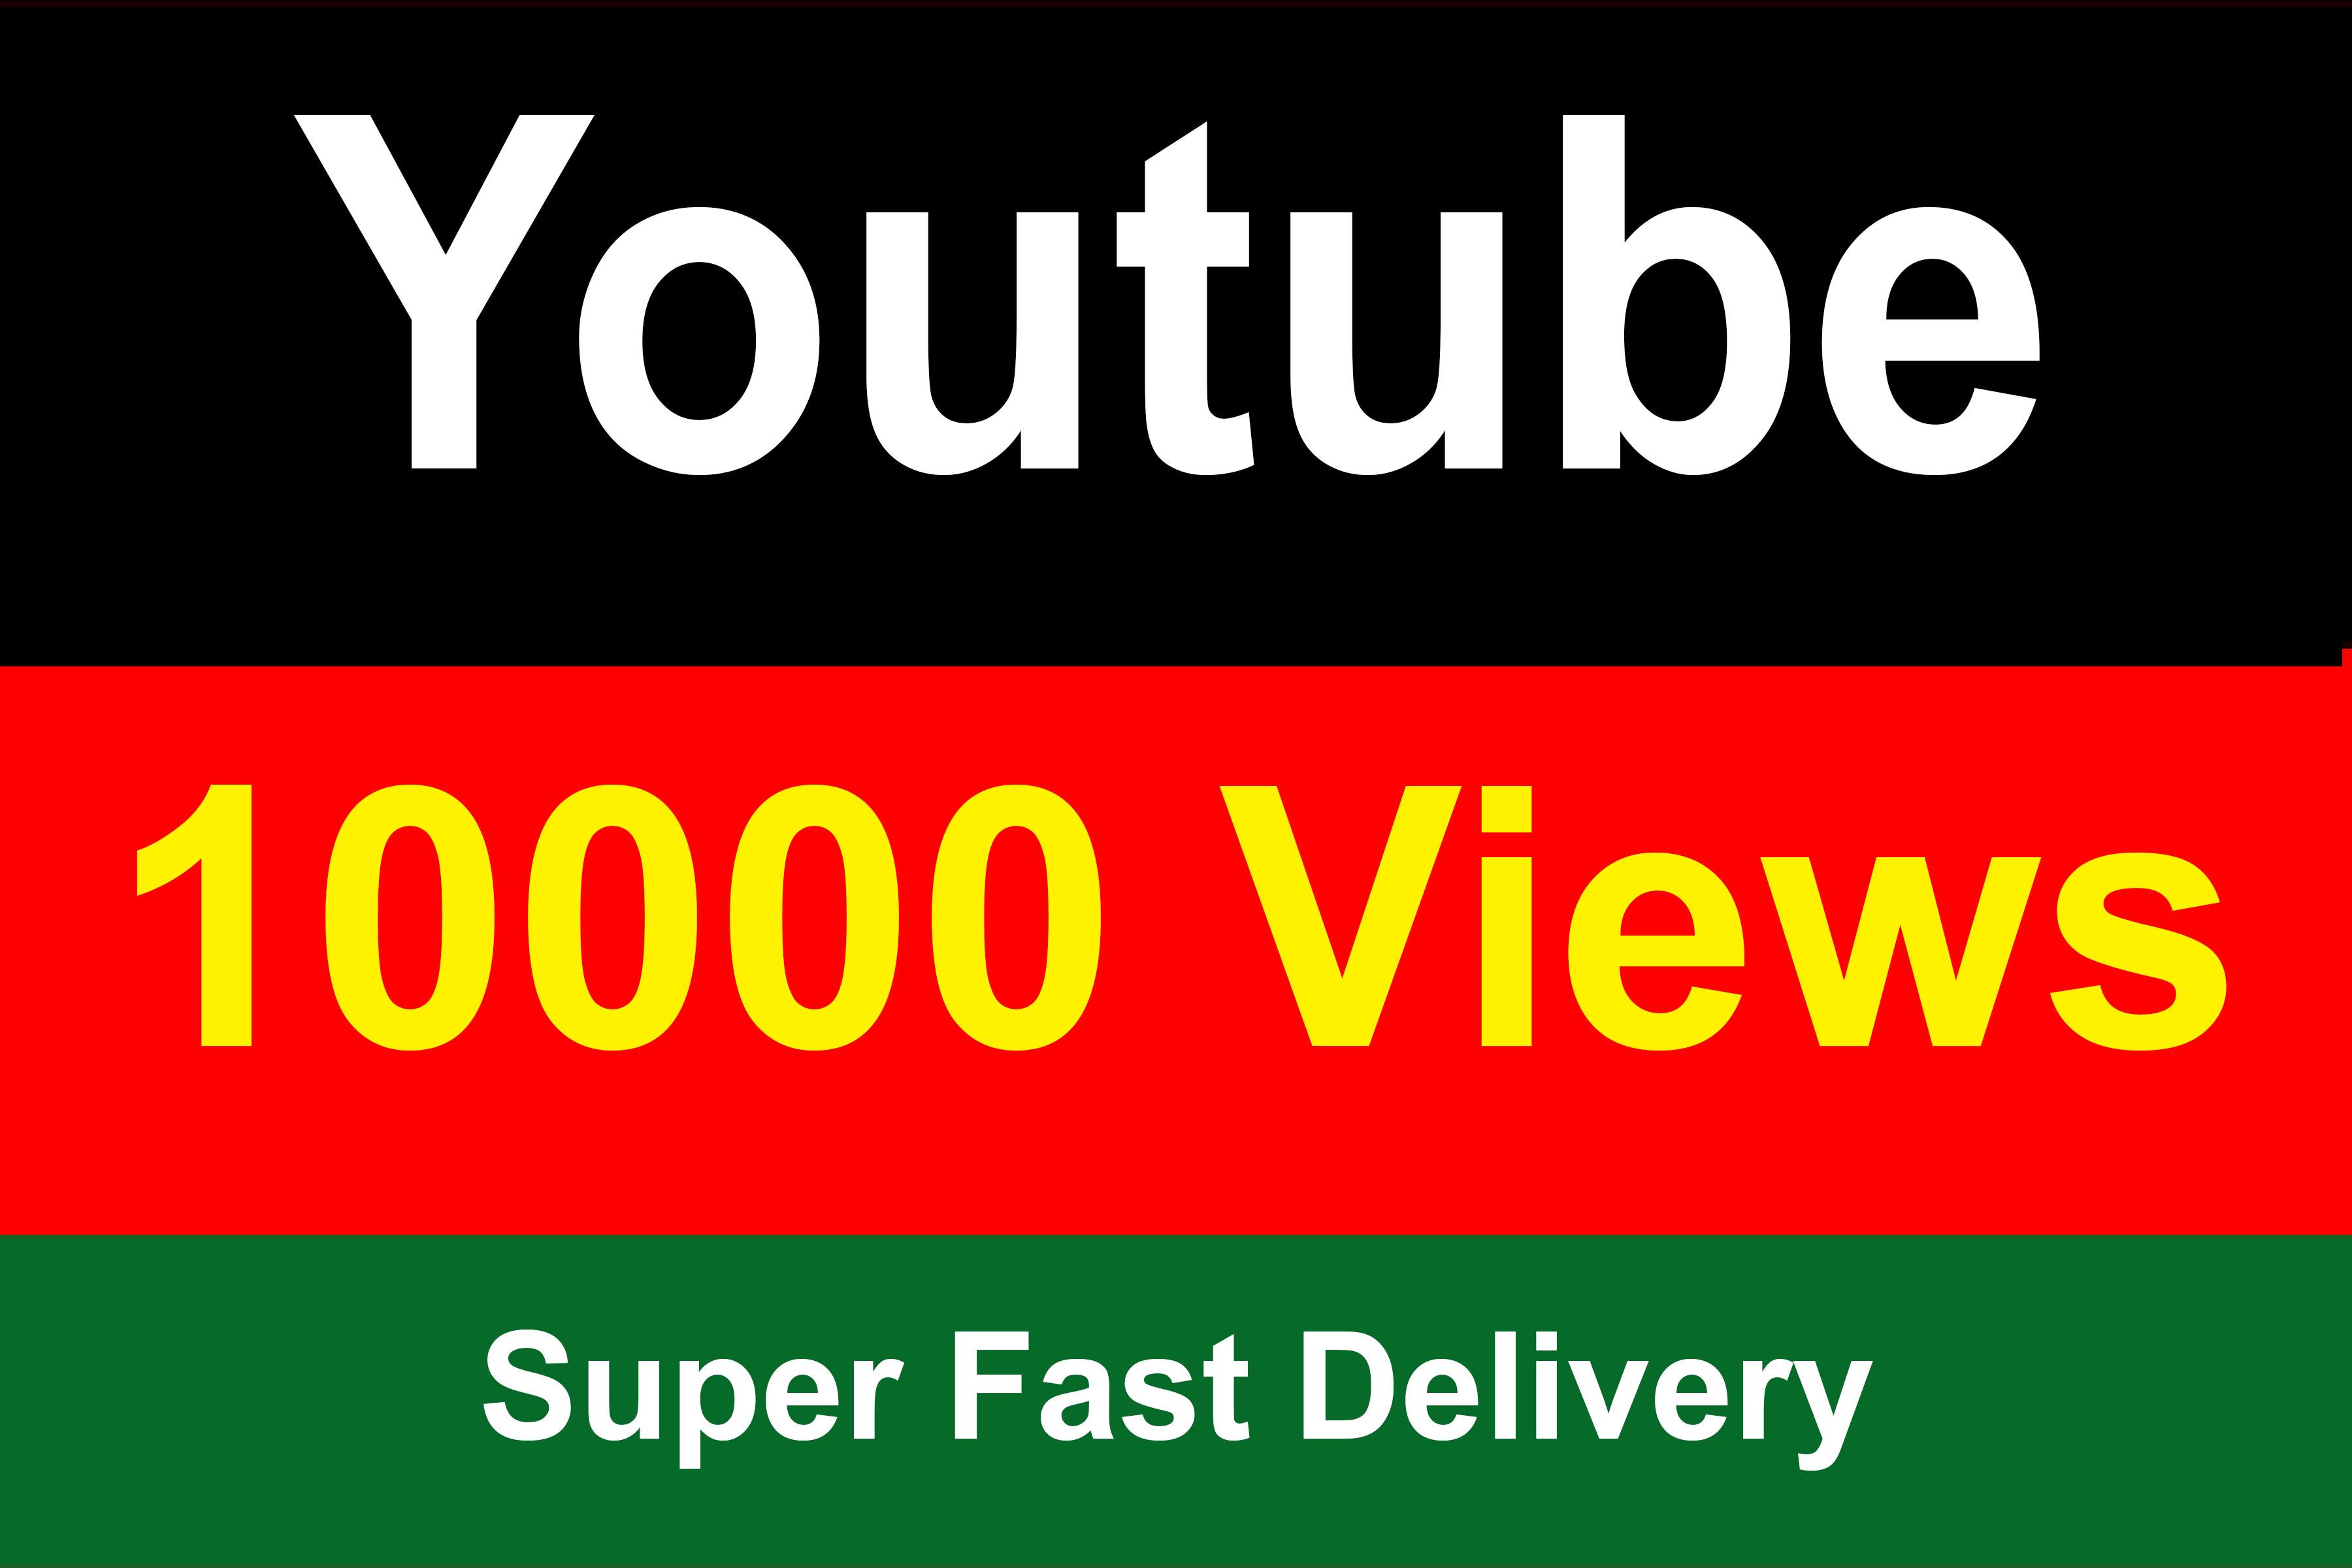 10000 Youtube Vie ws Instant Start Refile Guaranteed